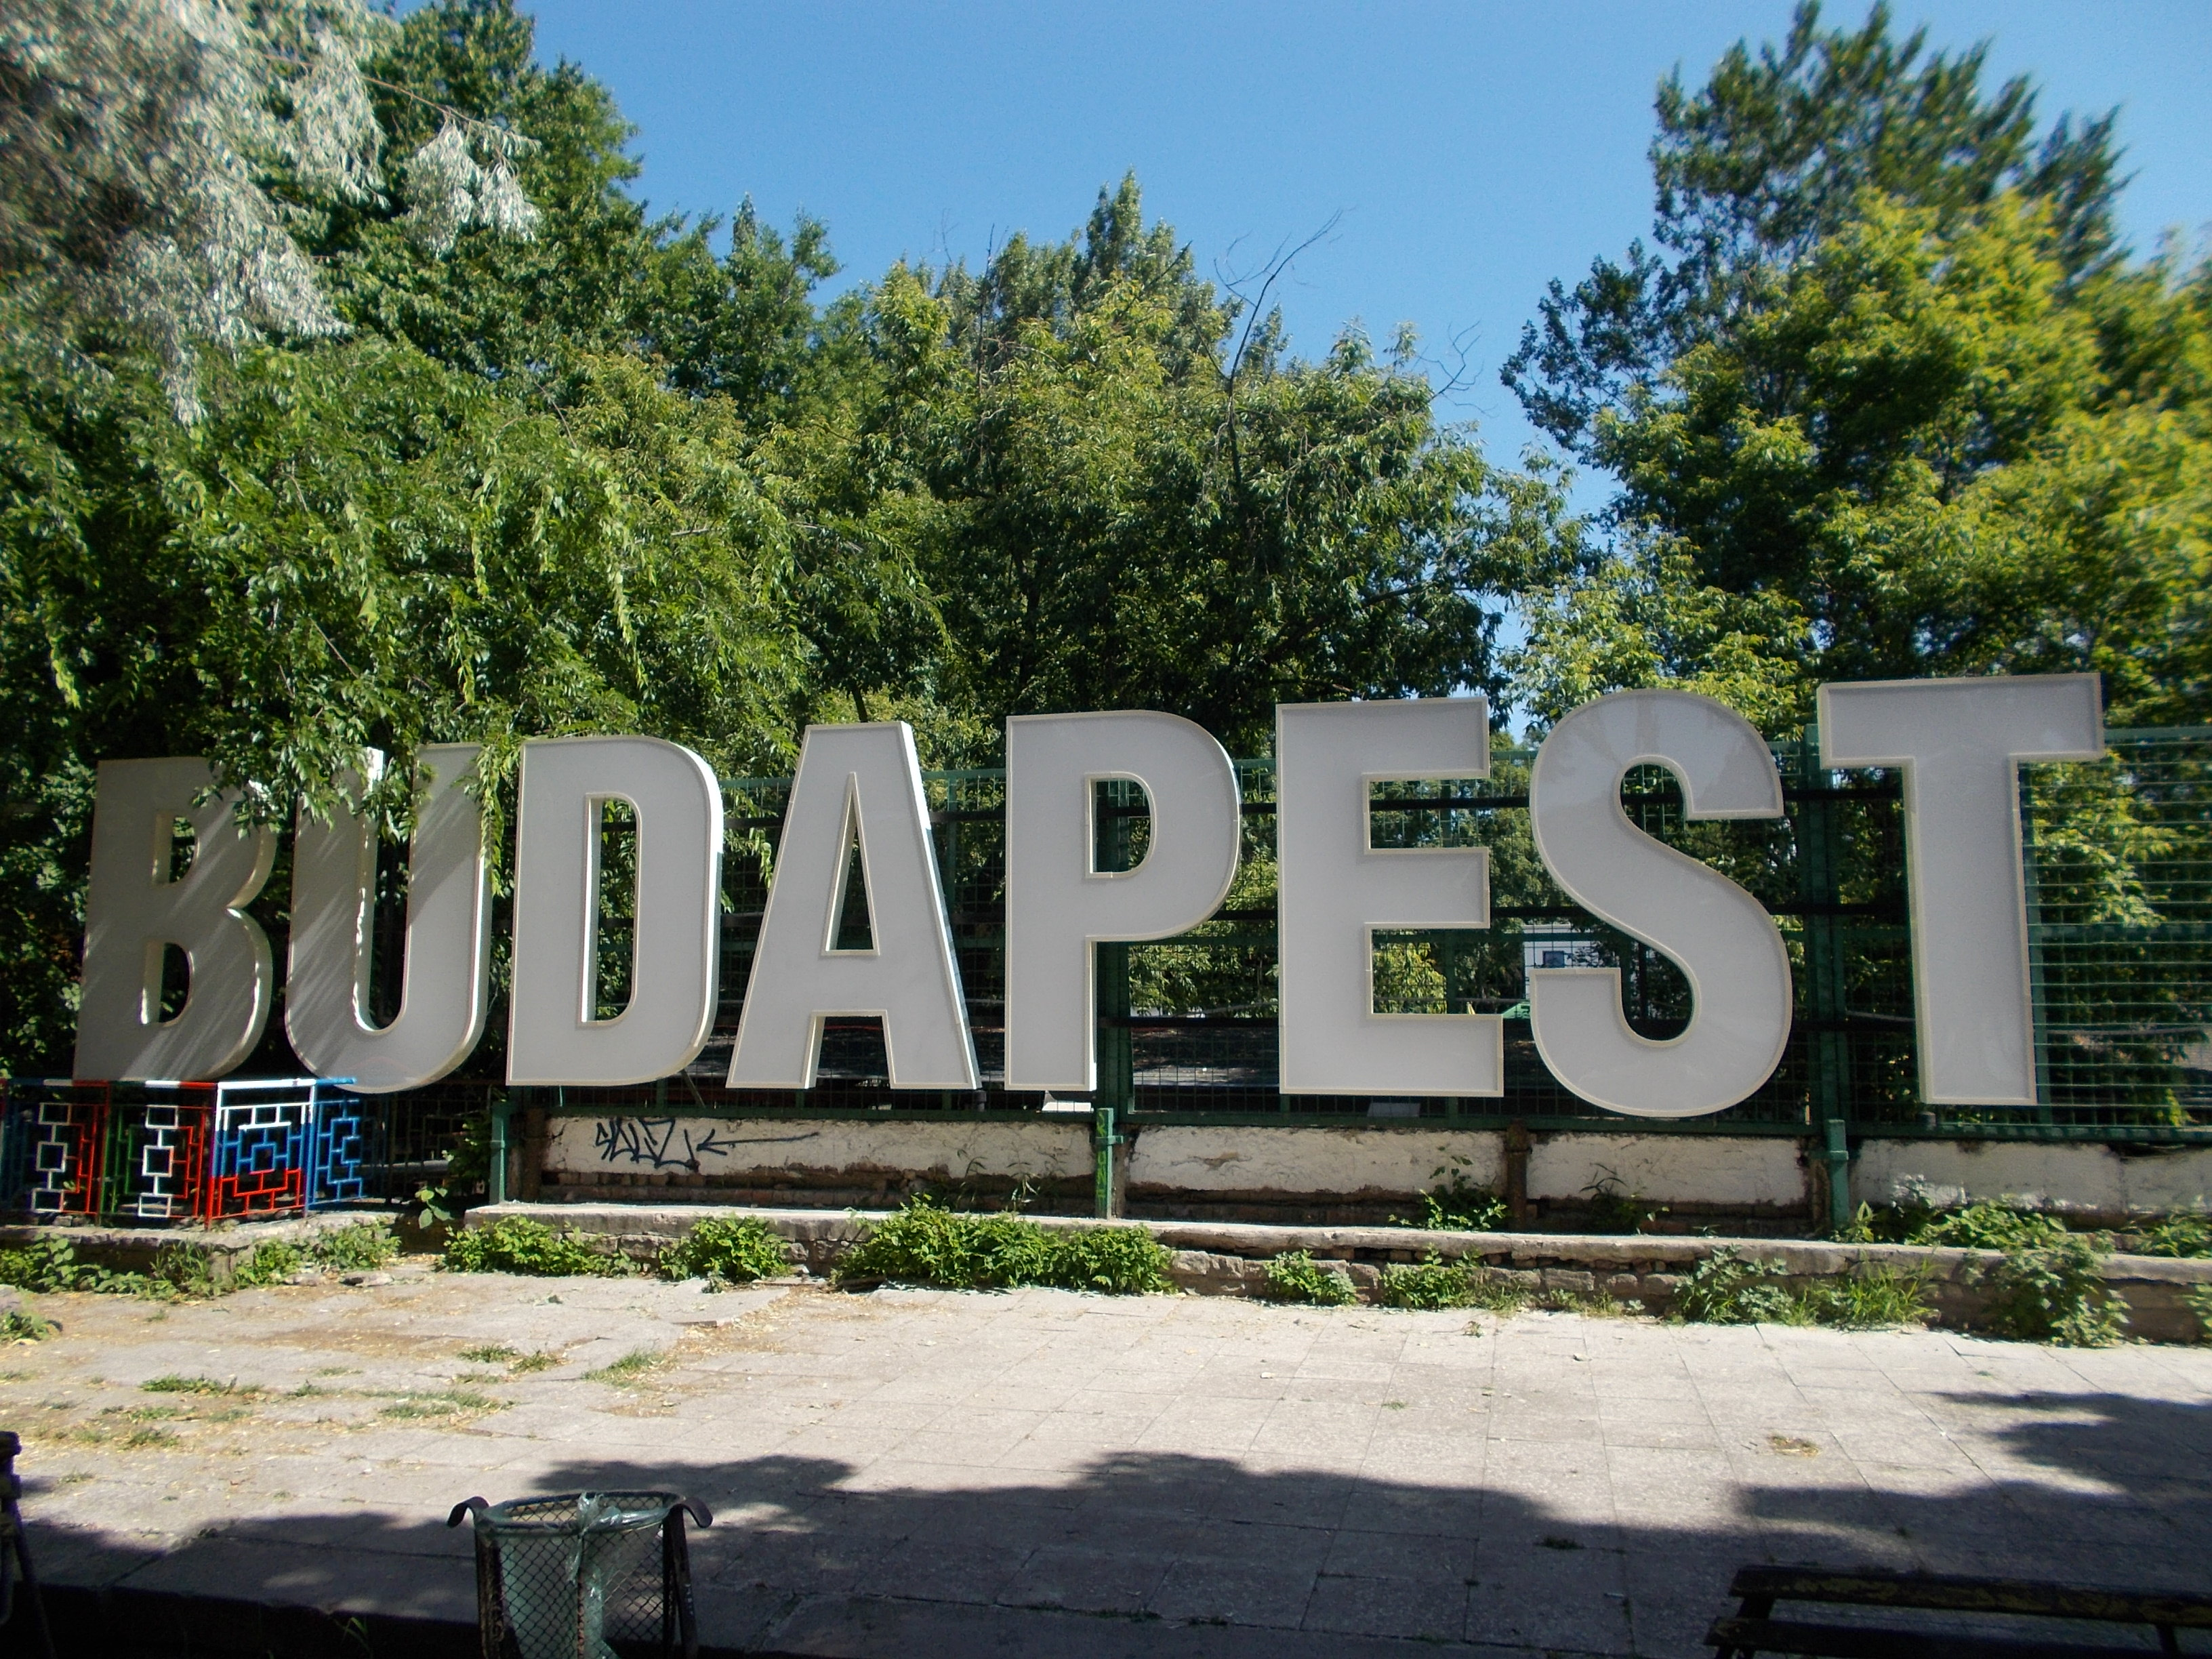 The Hollywood-style Budapest sign on Margaret Island